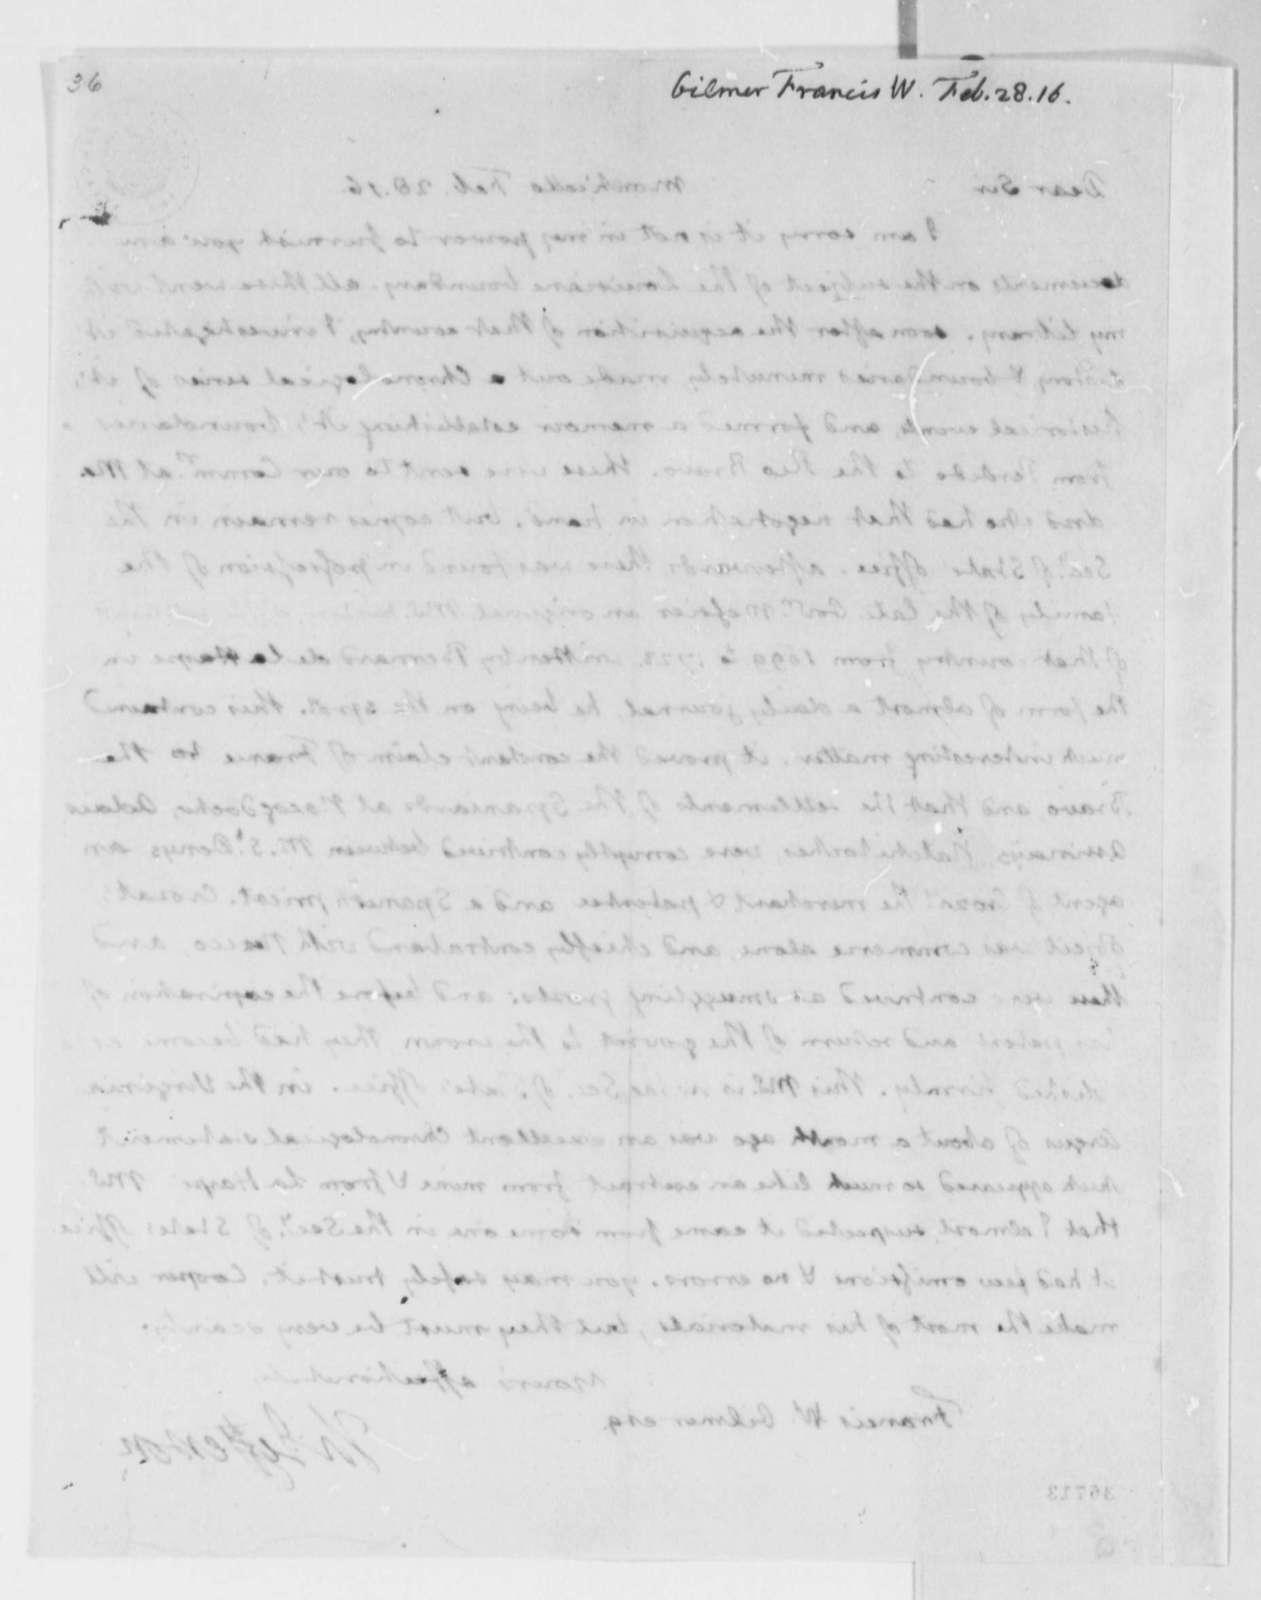 Thomas Jefferson to Francis W. Gilmer, February 28, 1816